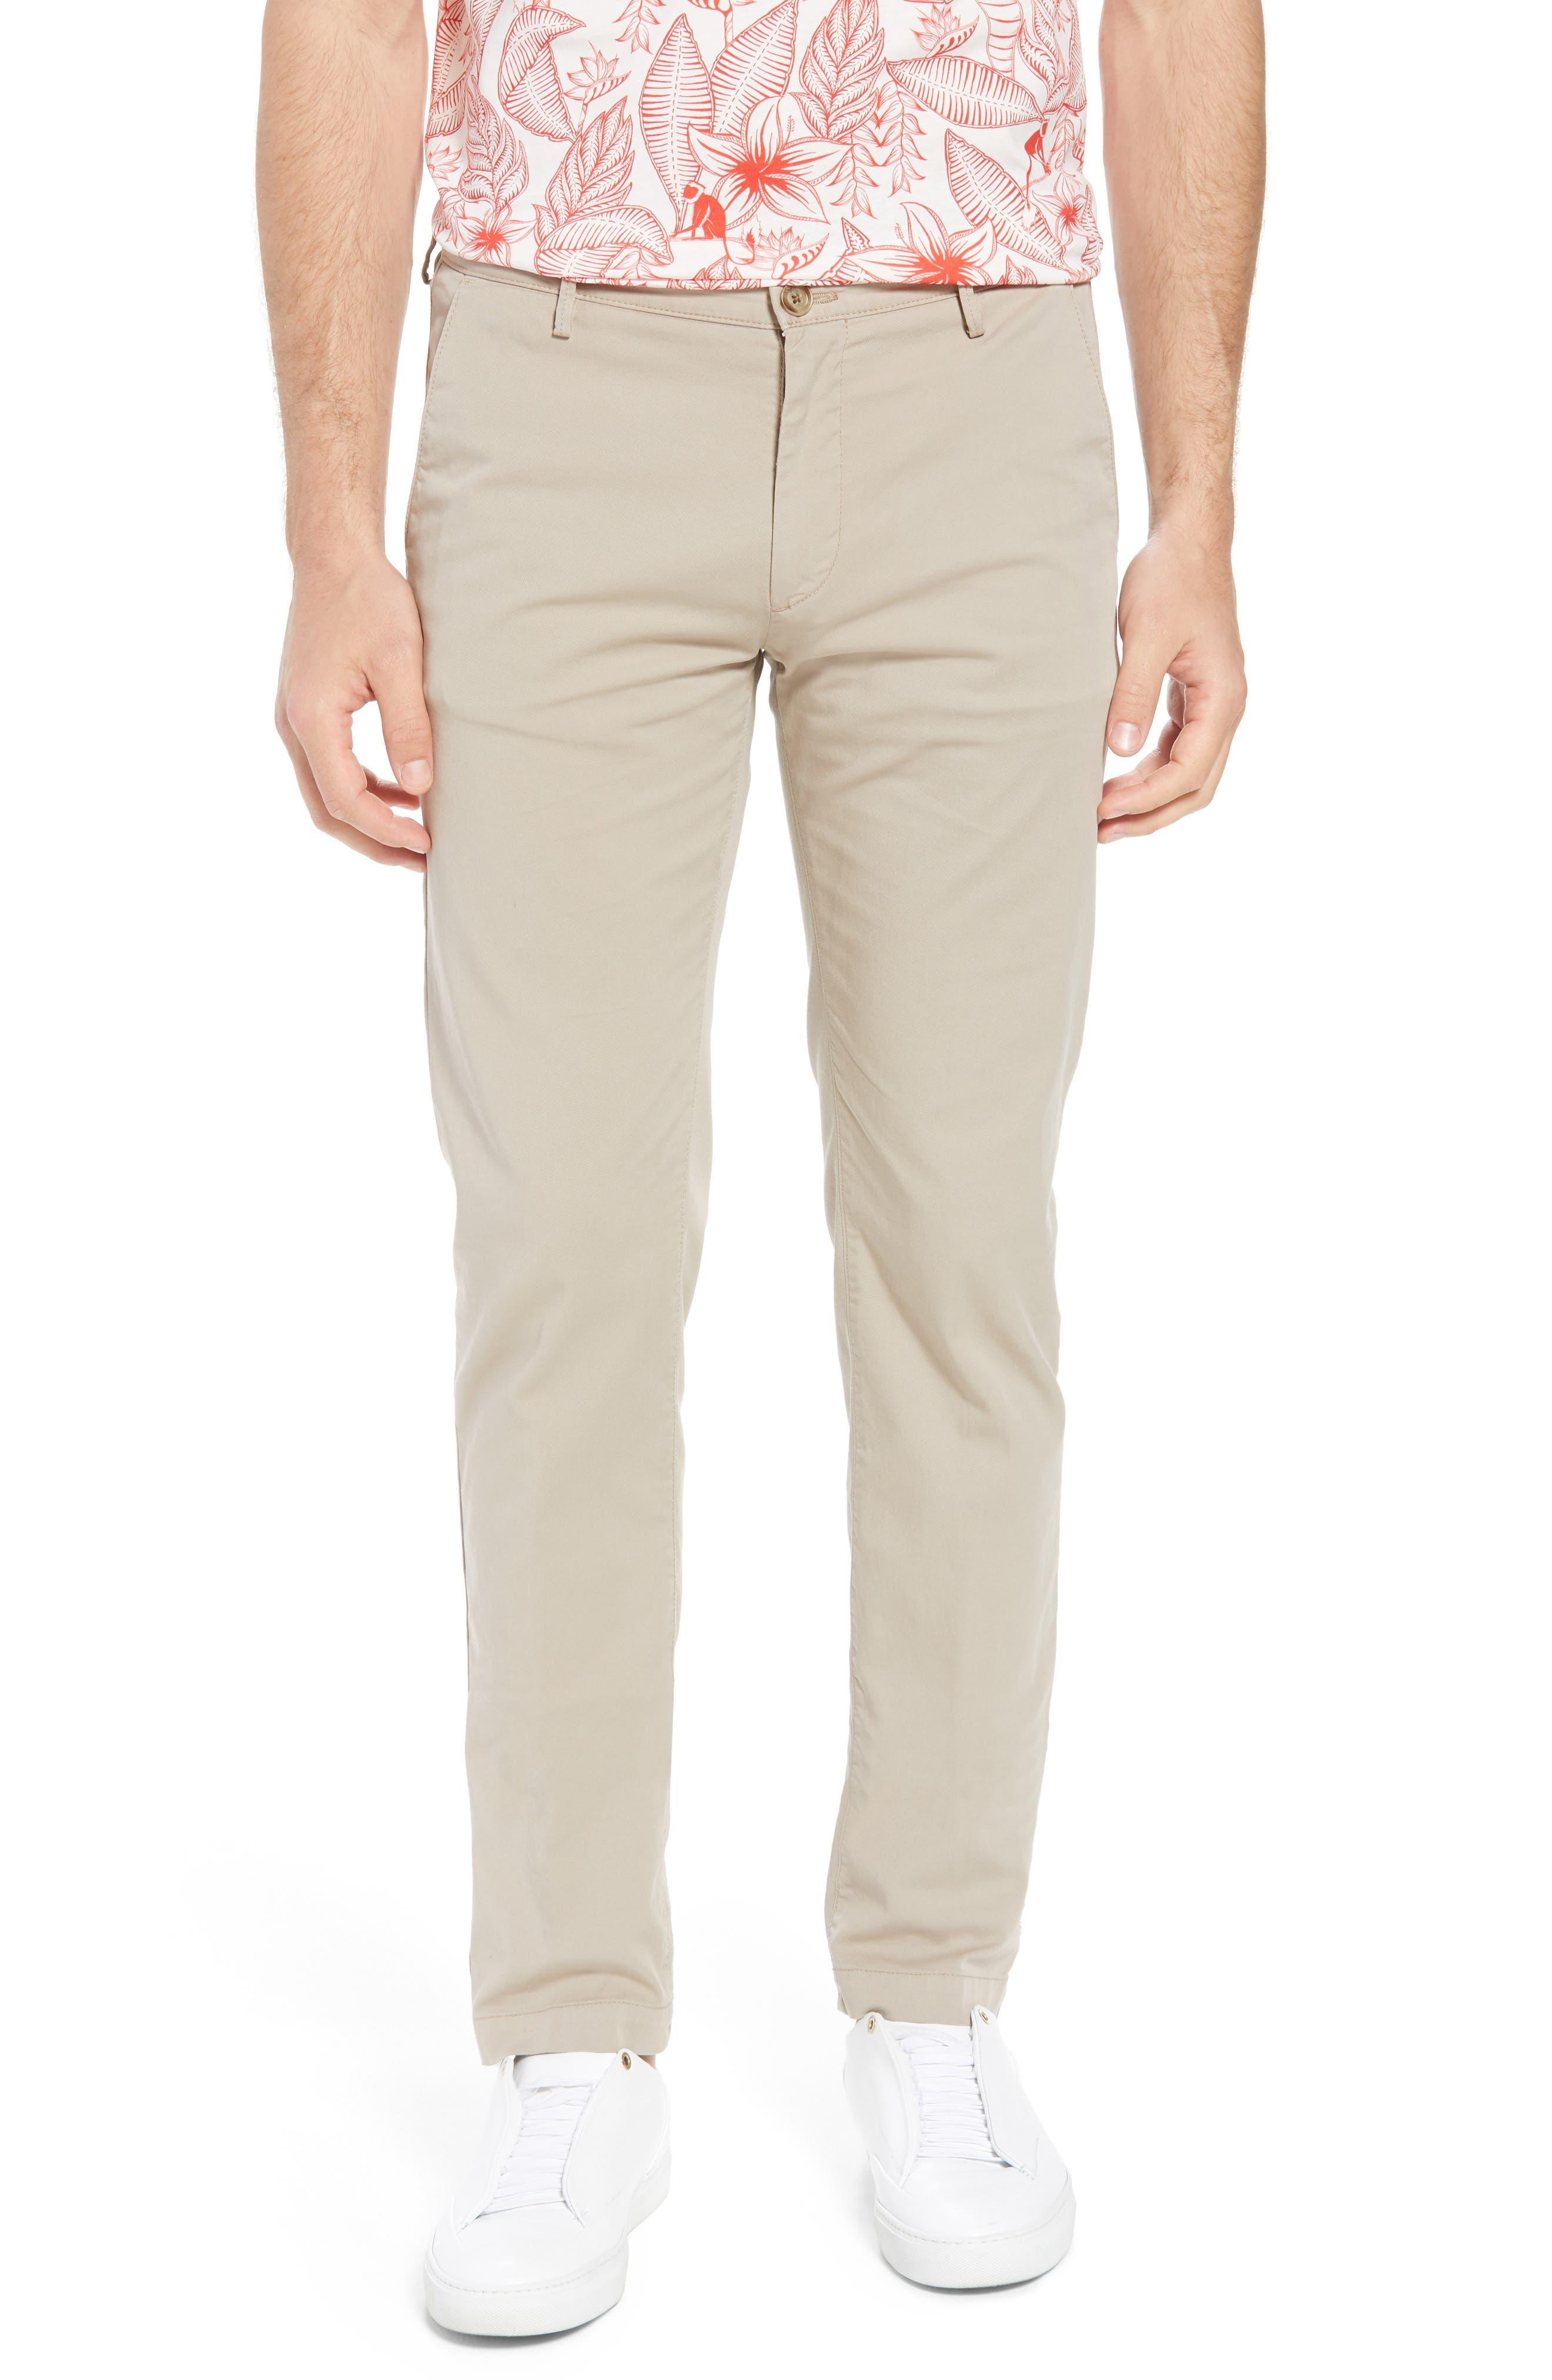 Rice Slim Fit Chino Pants,                         Main,                         color, 200